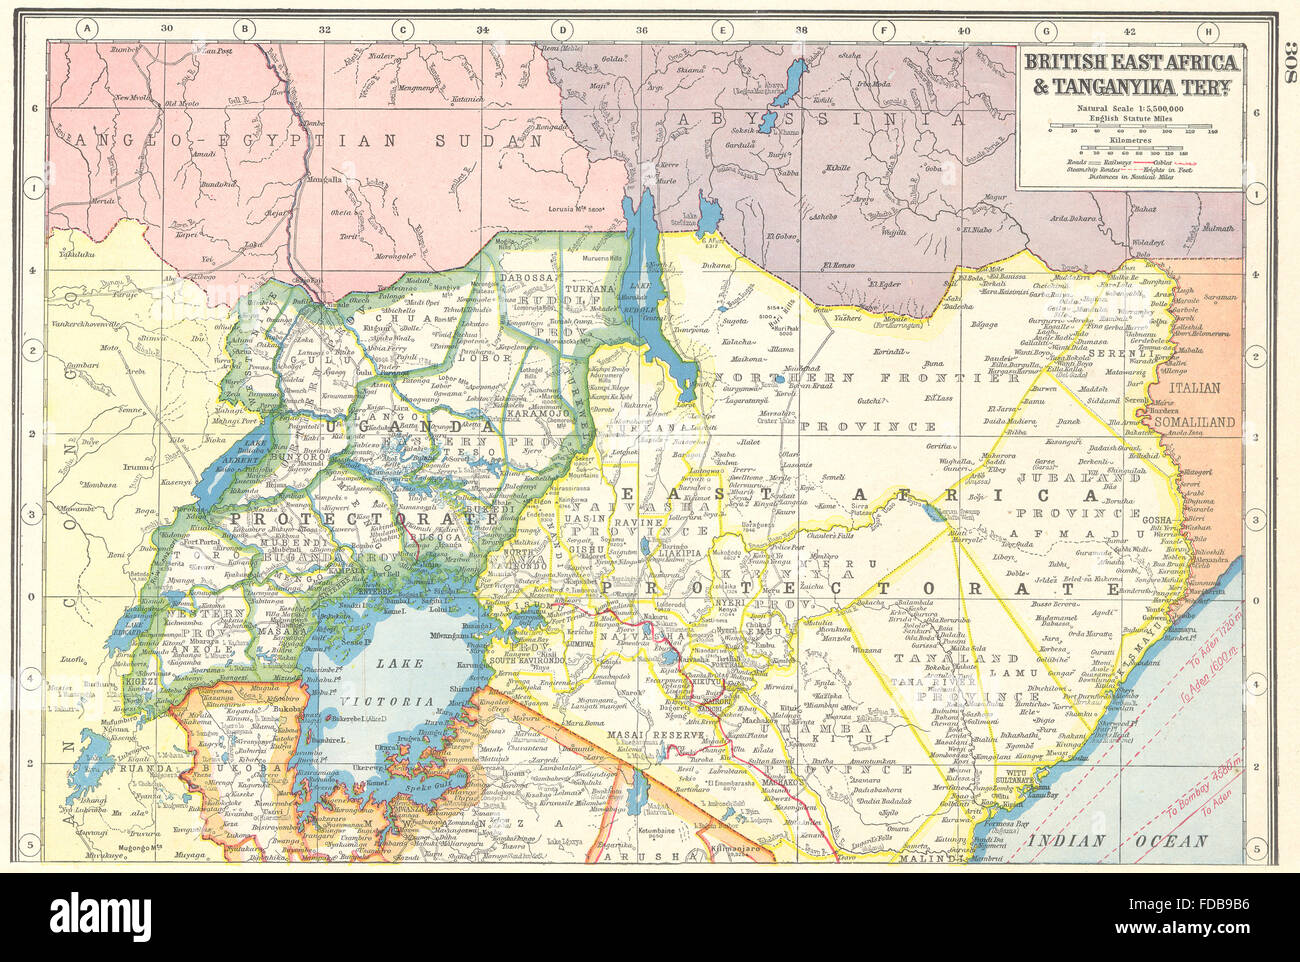 uganda on africa map